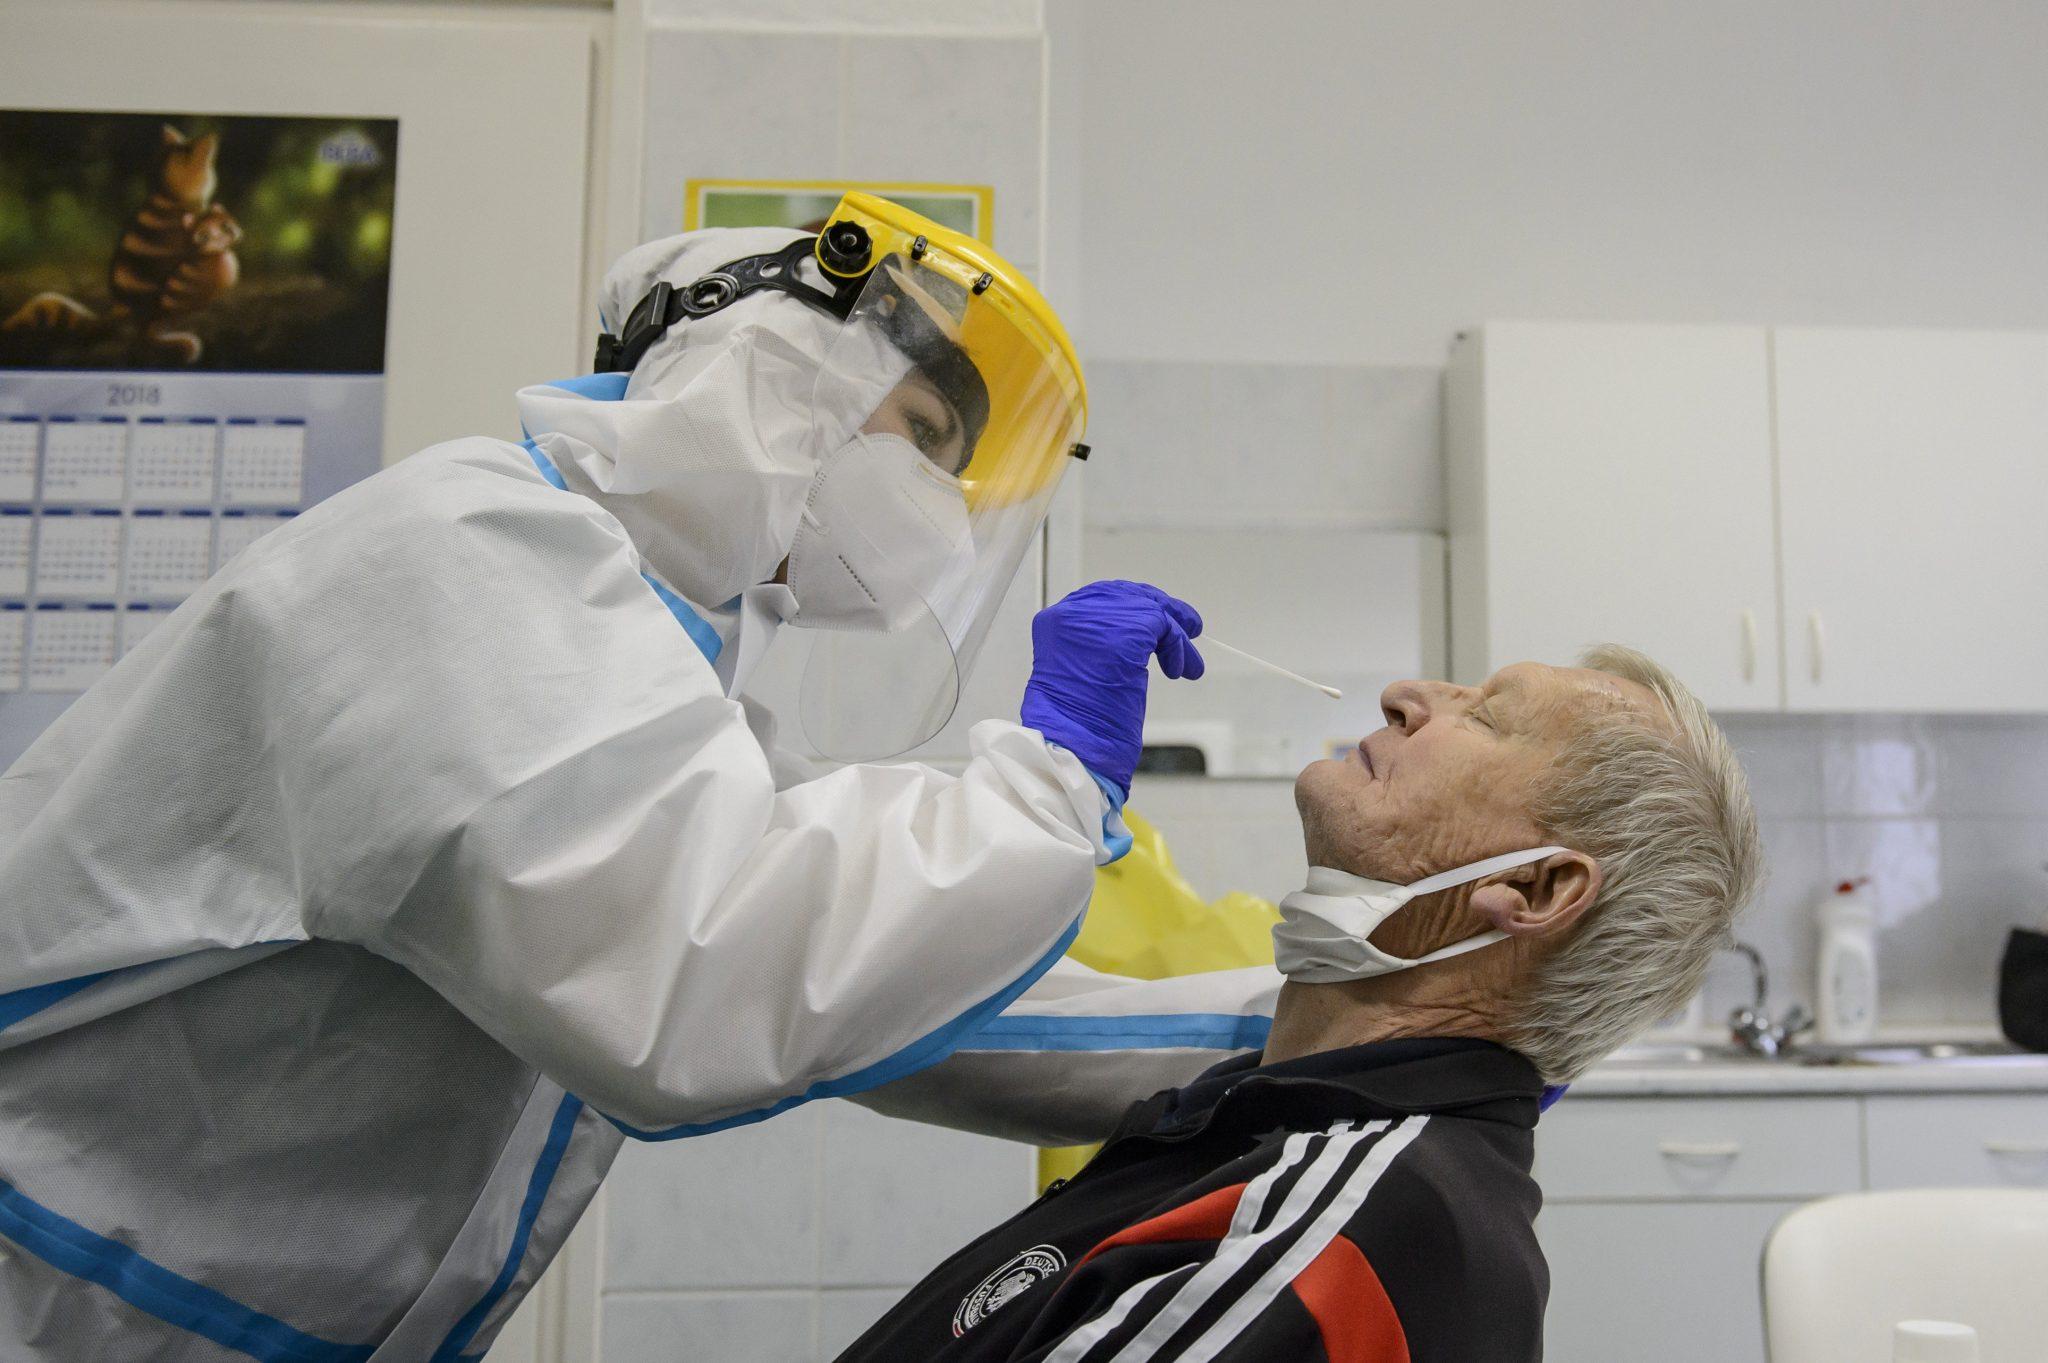 Coronavirus - National Health Centre: Karácsony 'Wrong' about Antigen Tests